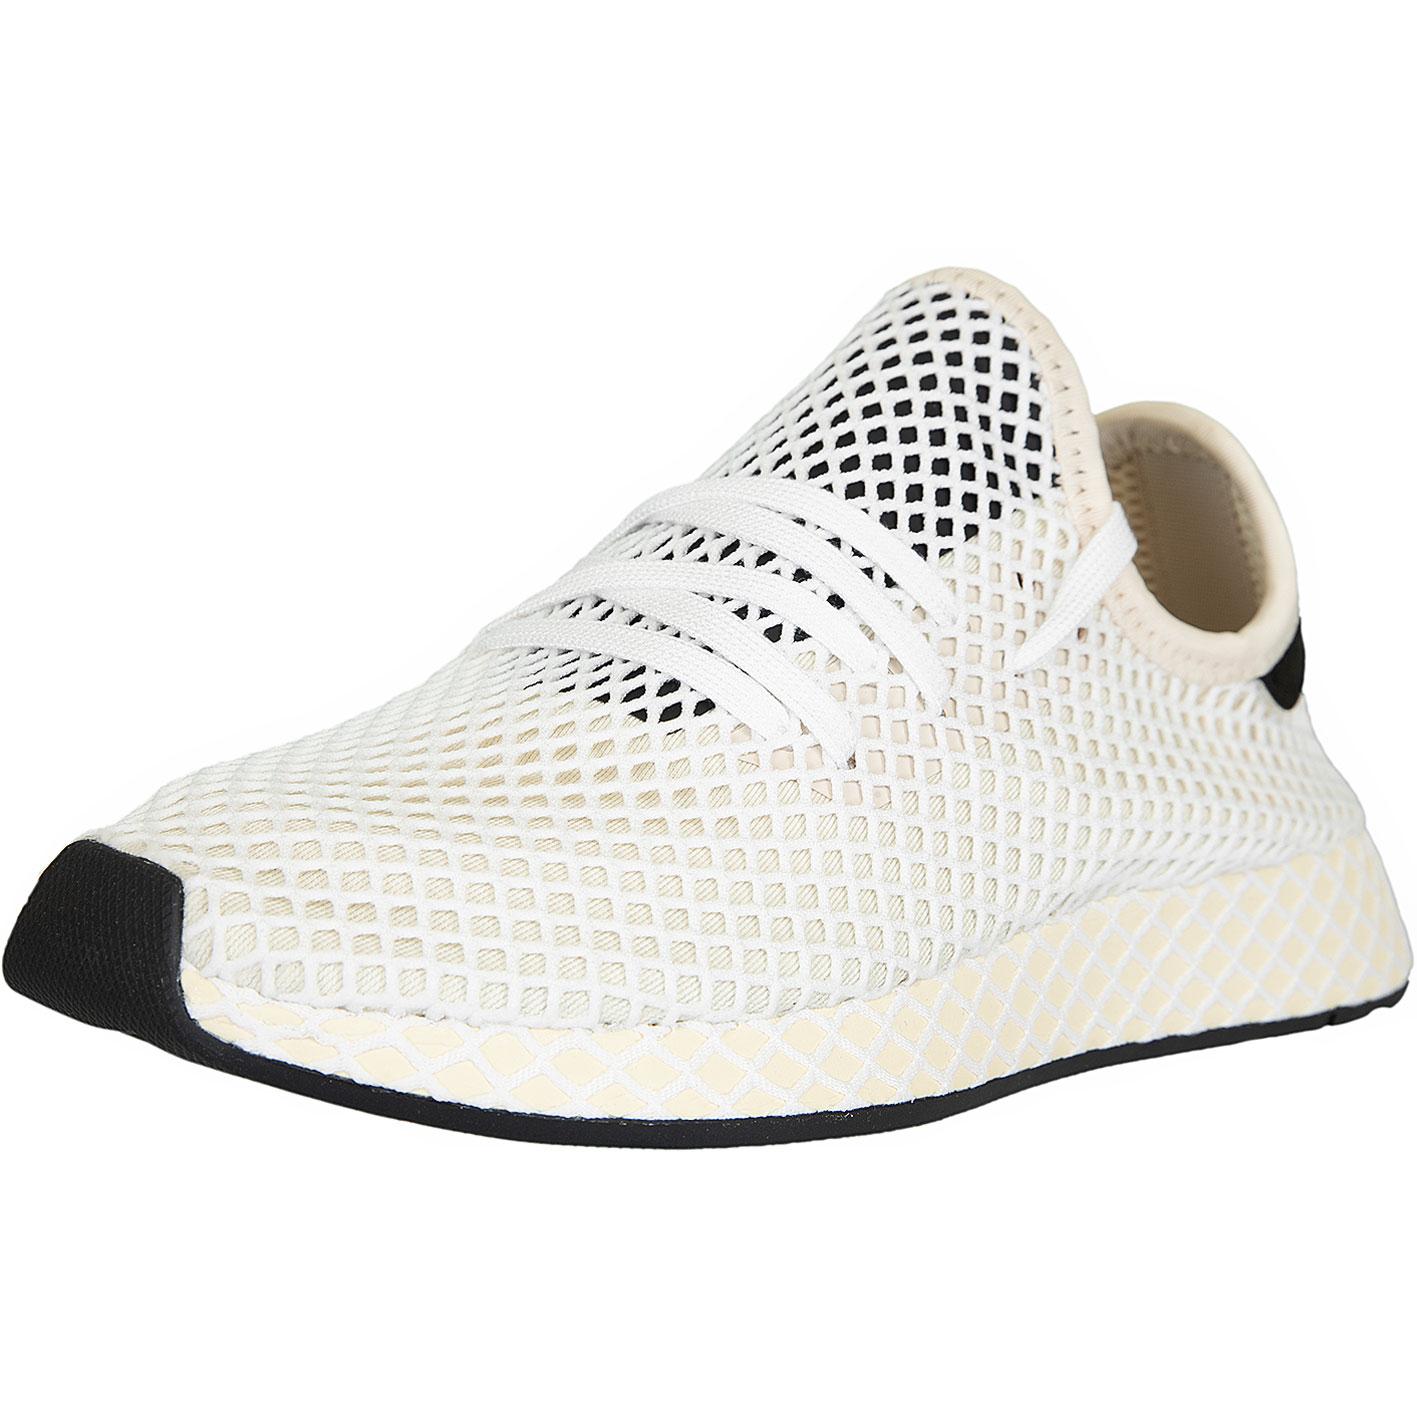 cheap for discount 65e05 ee2ea Adidas Originals Damen Sneaker Deerupt Runner beige